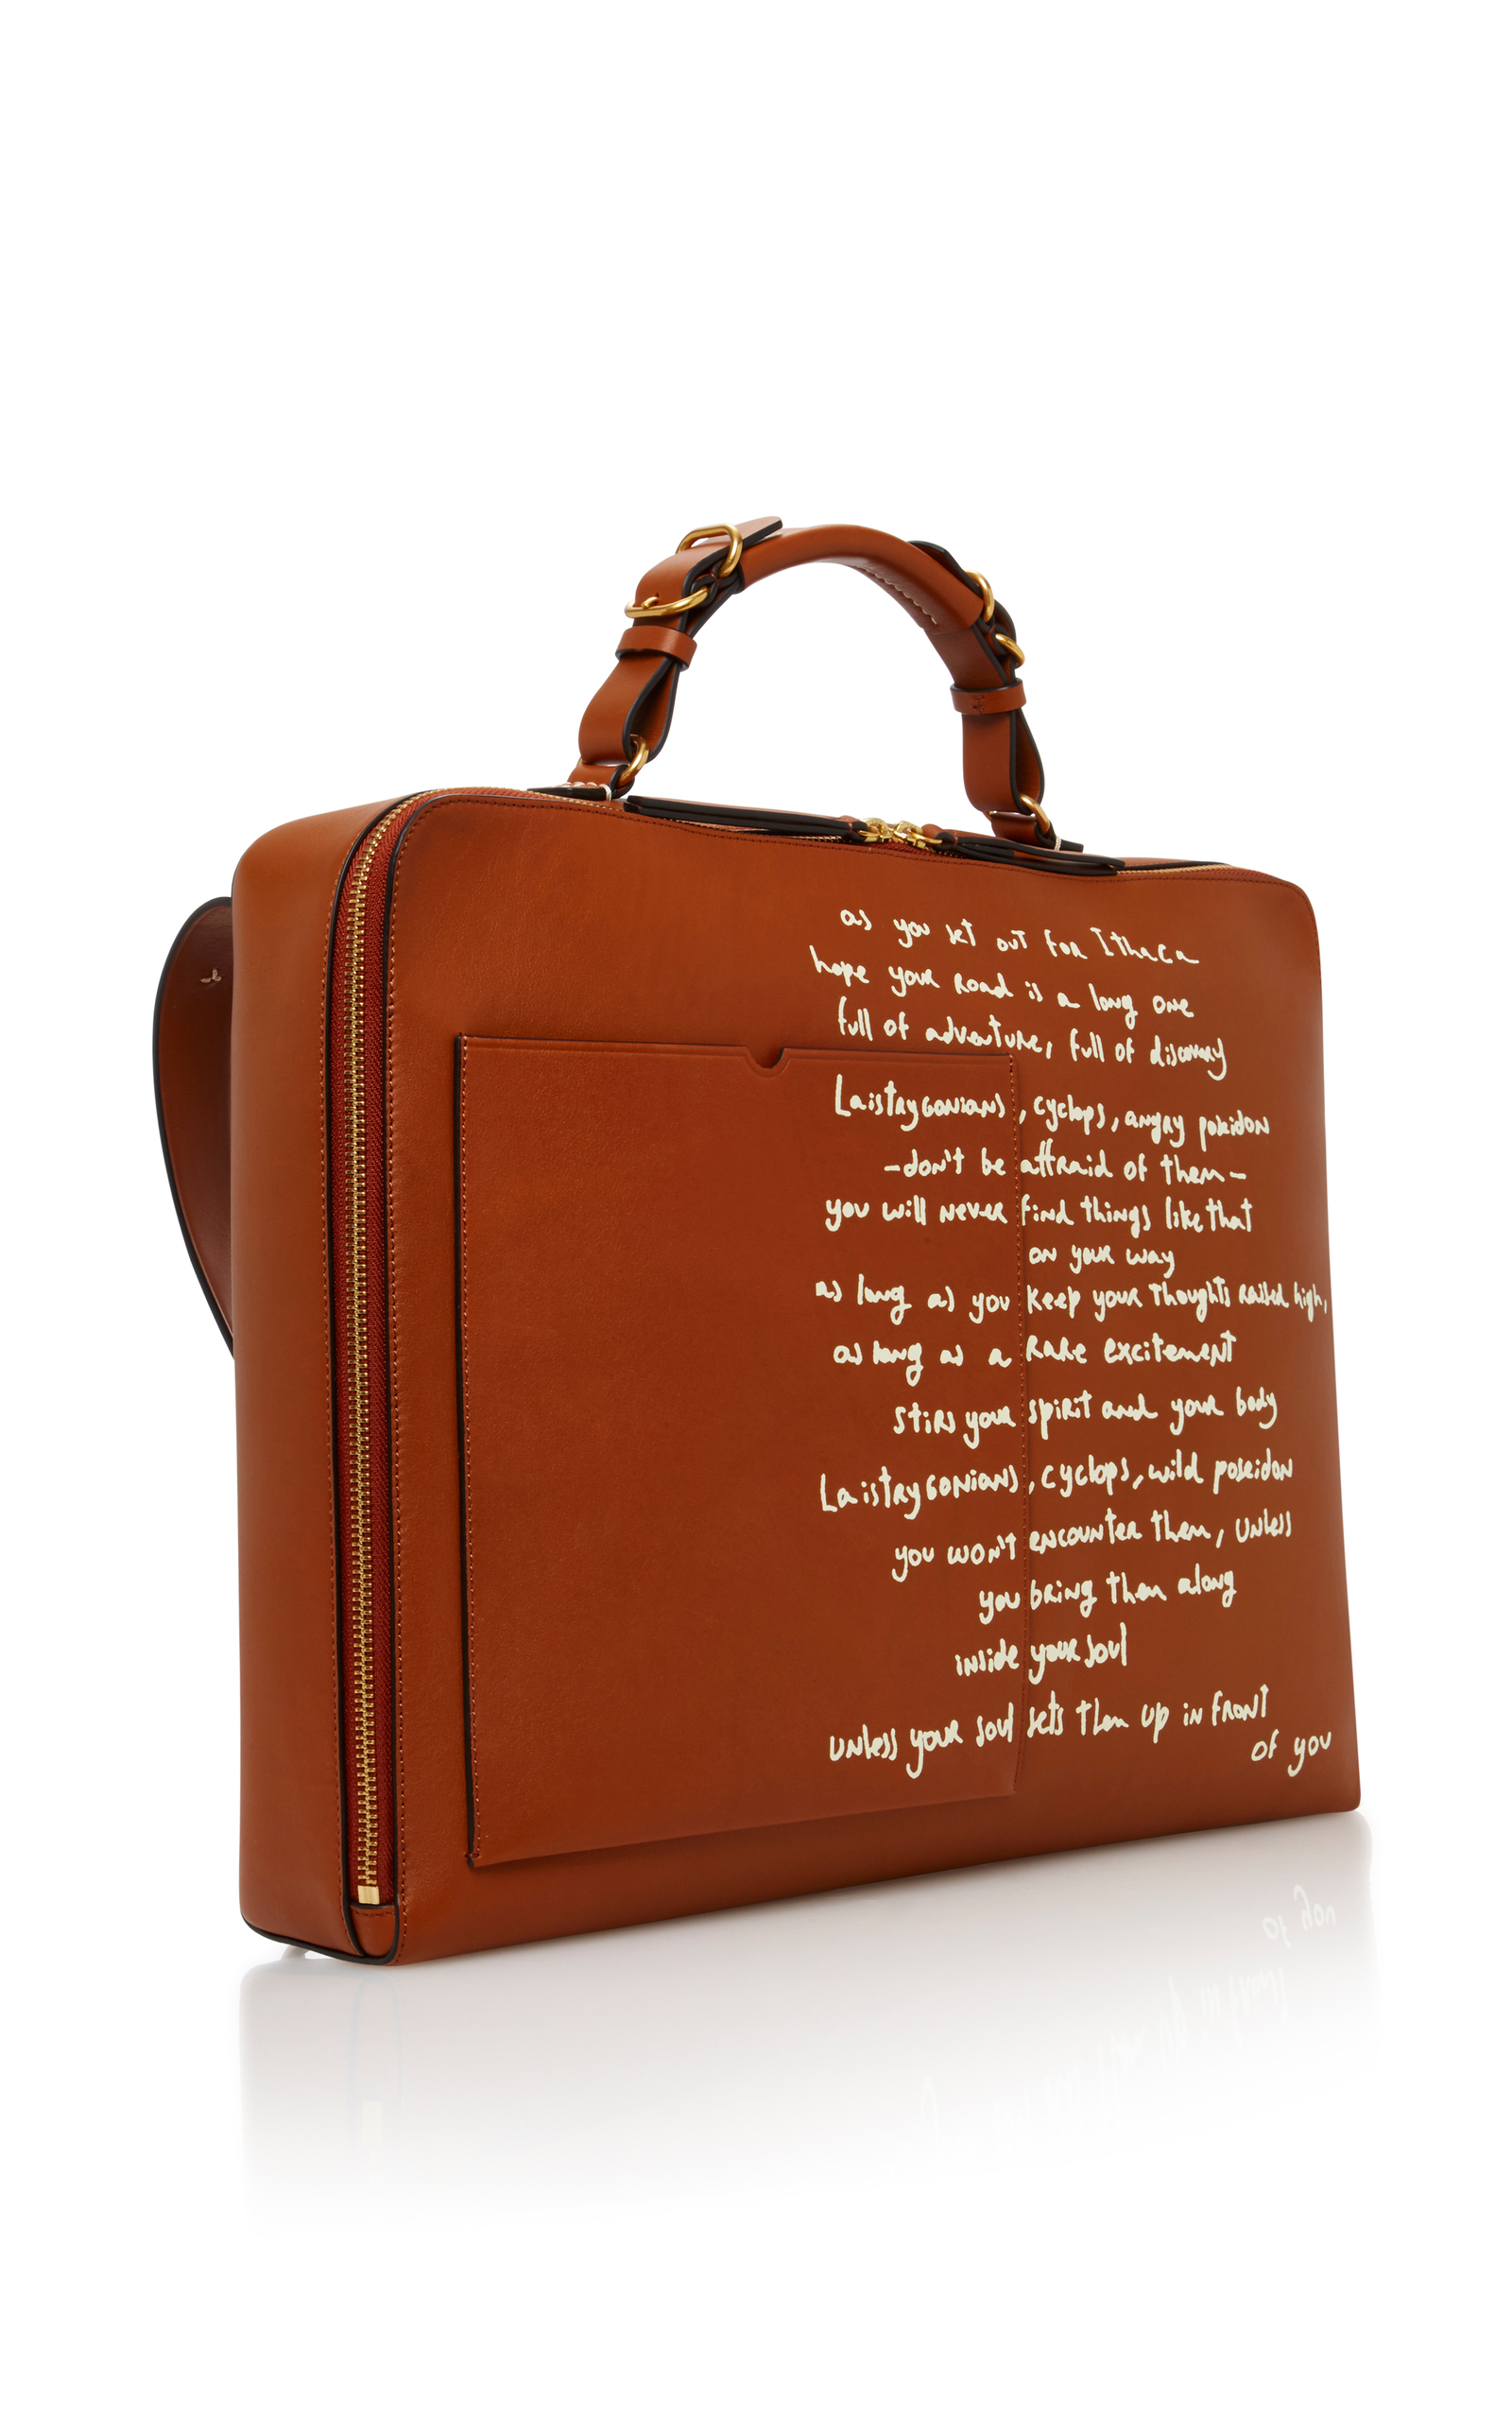 b6bb23e916ca Tory BurchArthur Script Large Briefcase. CLOSE. Loading. Loading. Loading